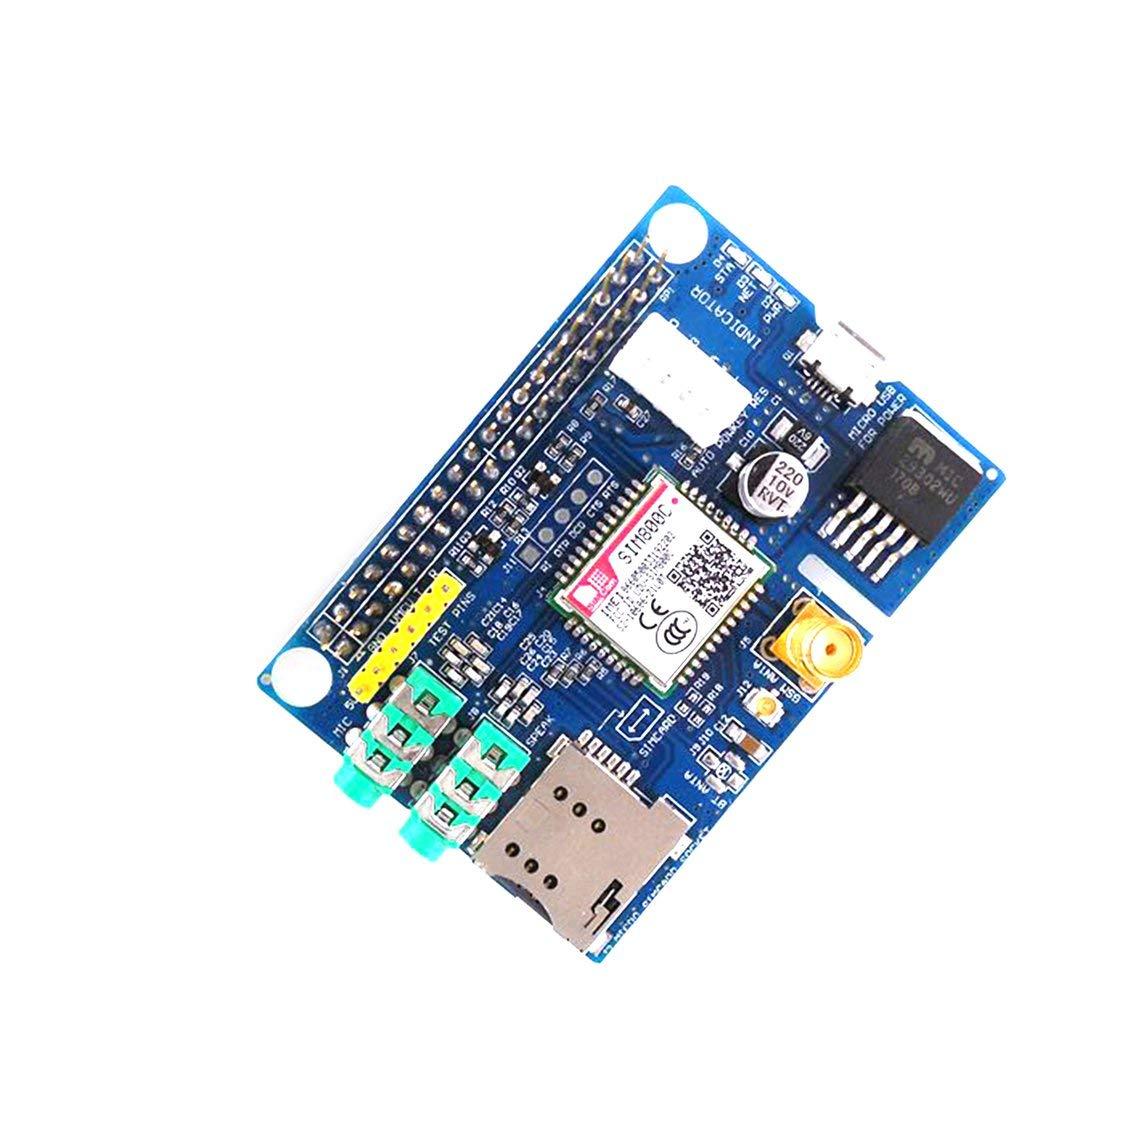 Blau /& Silber Professionelle Kleine Gr/ö/ße SIM800C GSM GPRS Modul Quad-band Entwicklungsboard Modul Geeignet f/ür Raspberry Pi